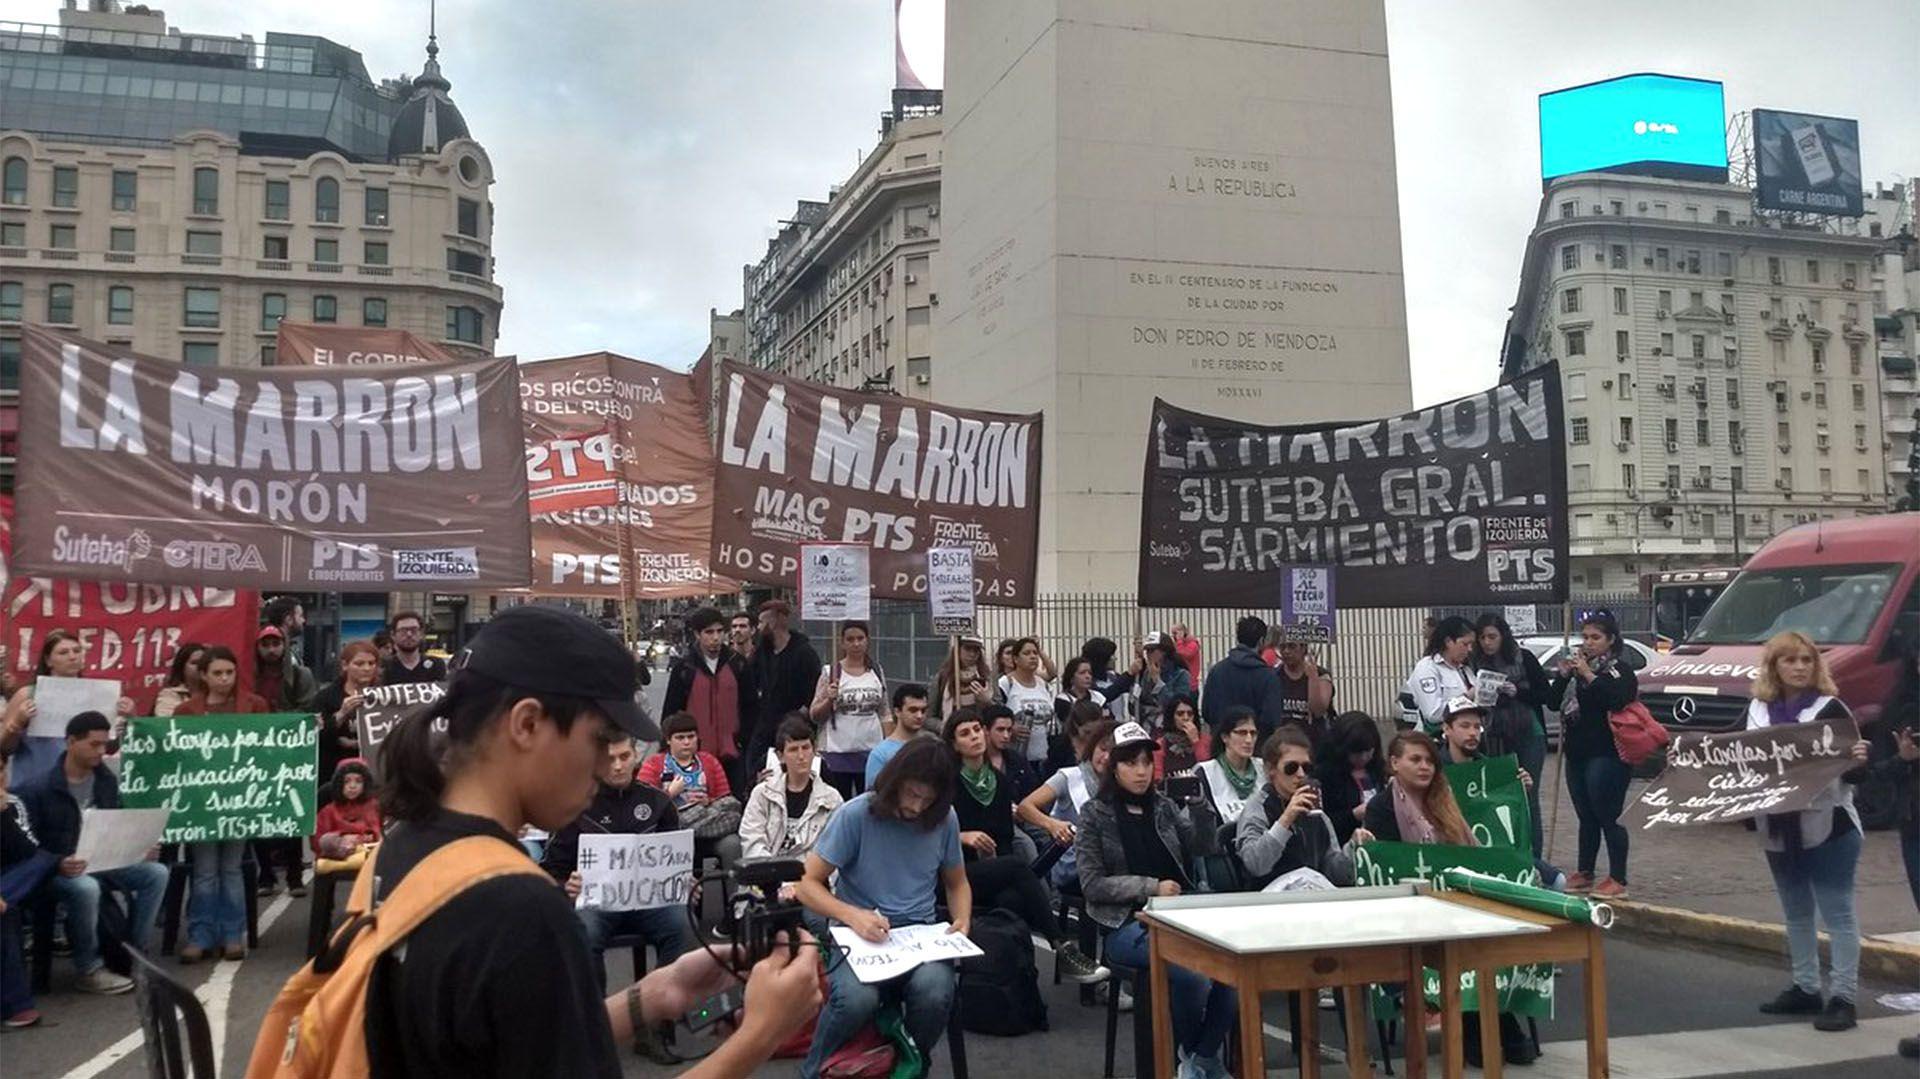 Temprano, los docentes se instalaron frente al Obelisco (foto: @PTSPrensa)